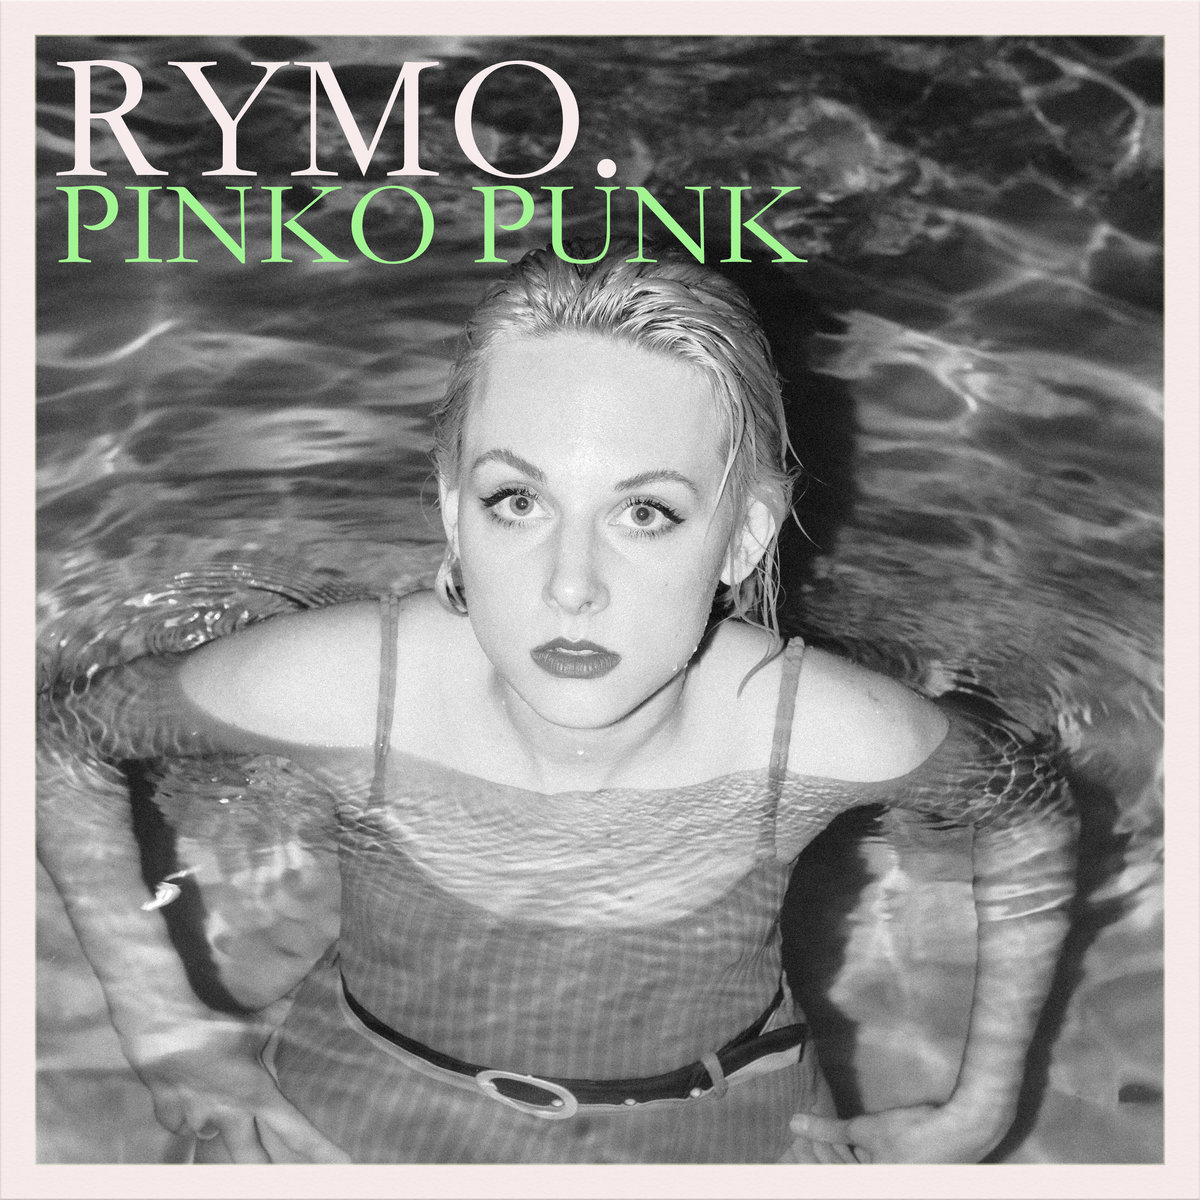 RYMO Releases Folksy Debut LP, Pinko Punk